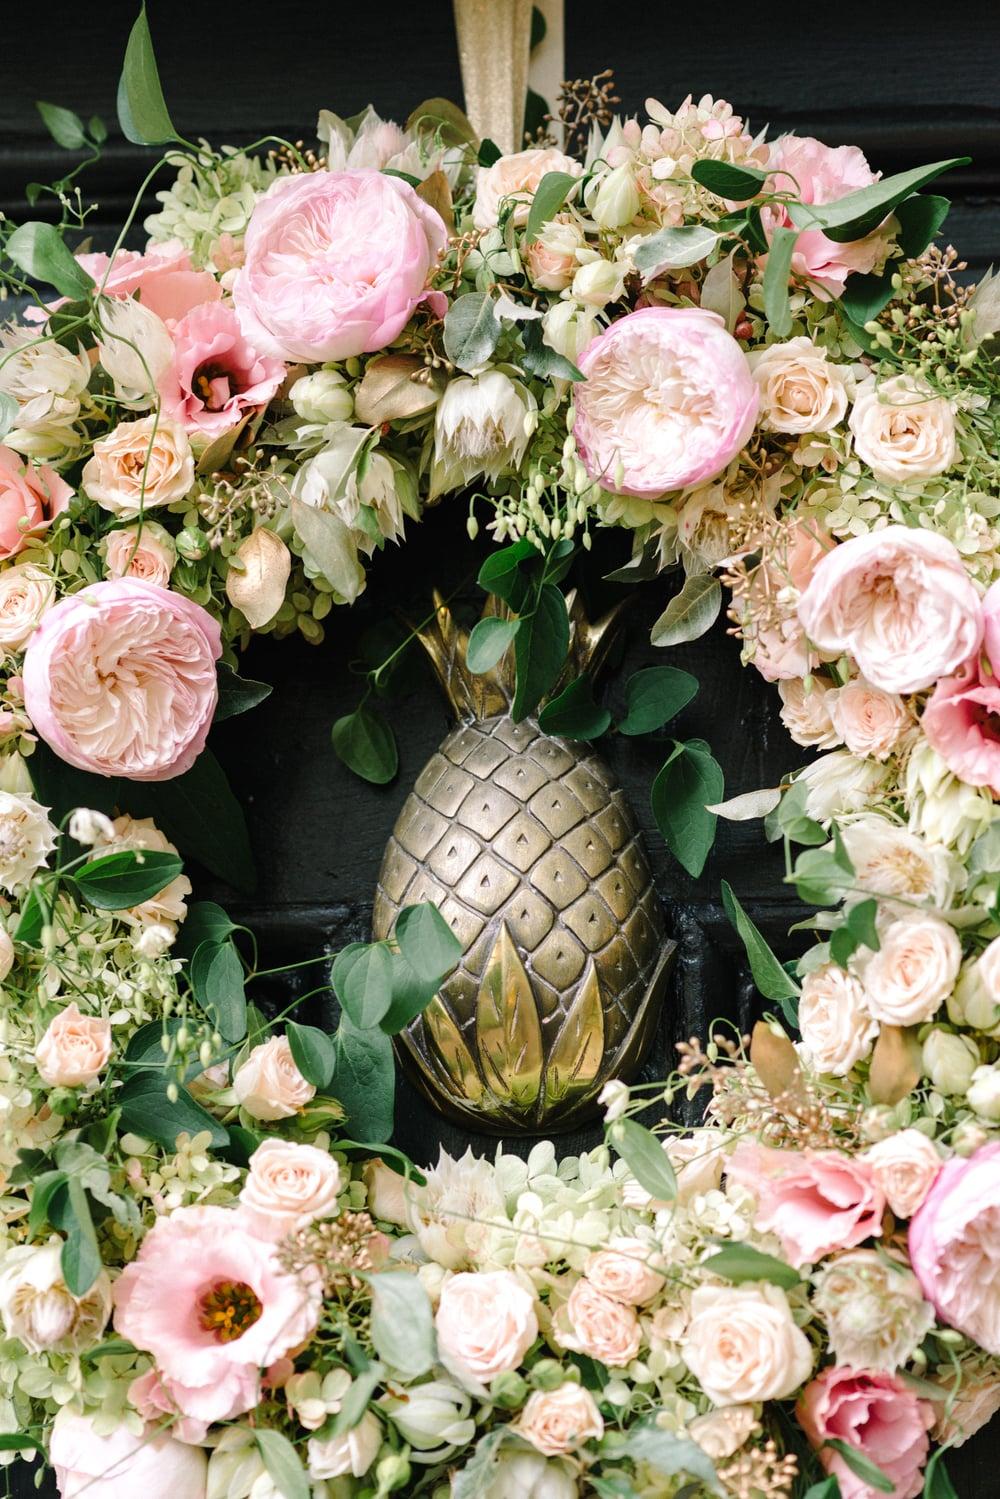 A Garden Party Florist, Inn at Fernbrook Farms, Michelle Lange Photography, Blush, Wreath